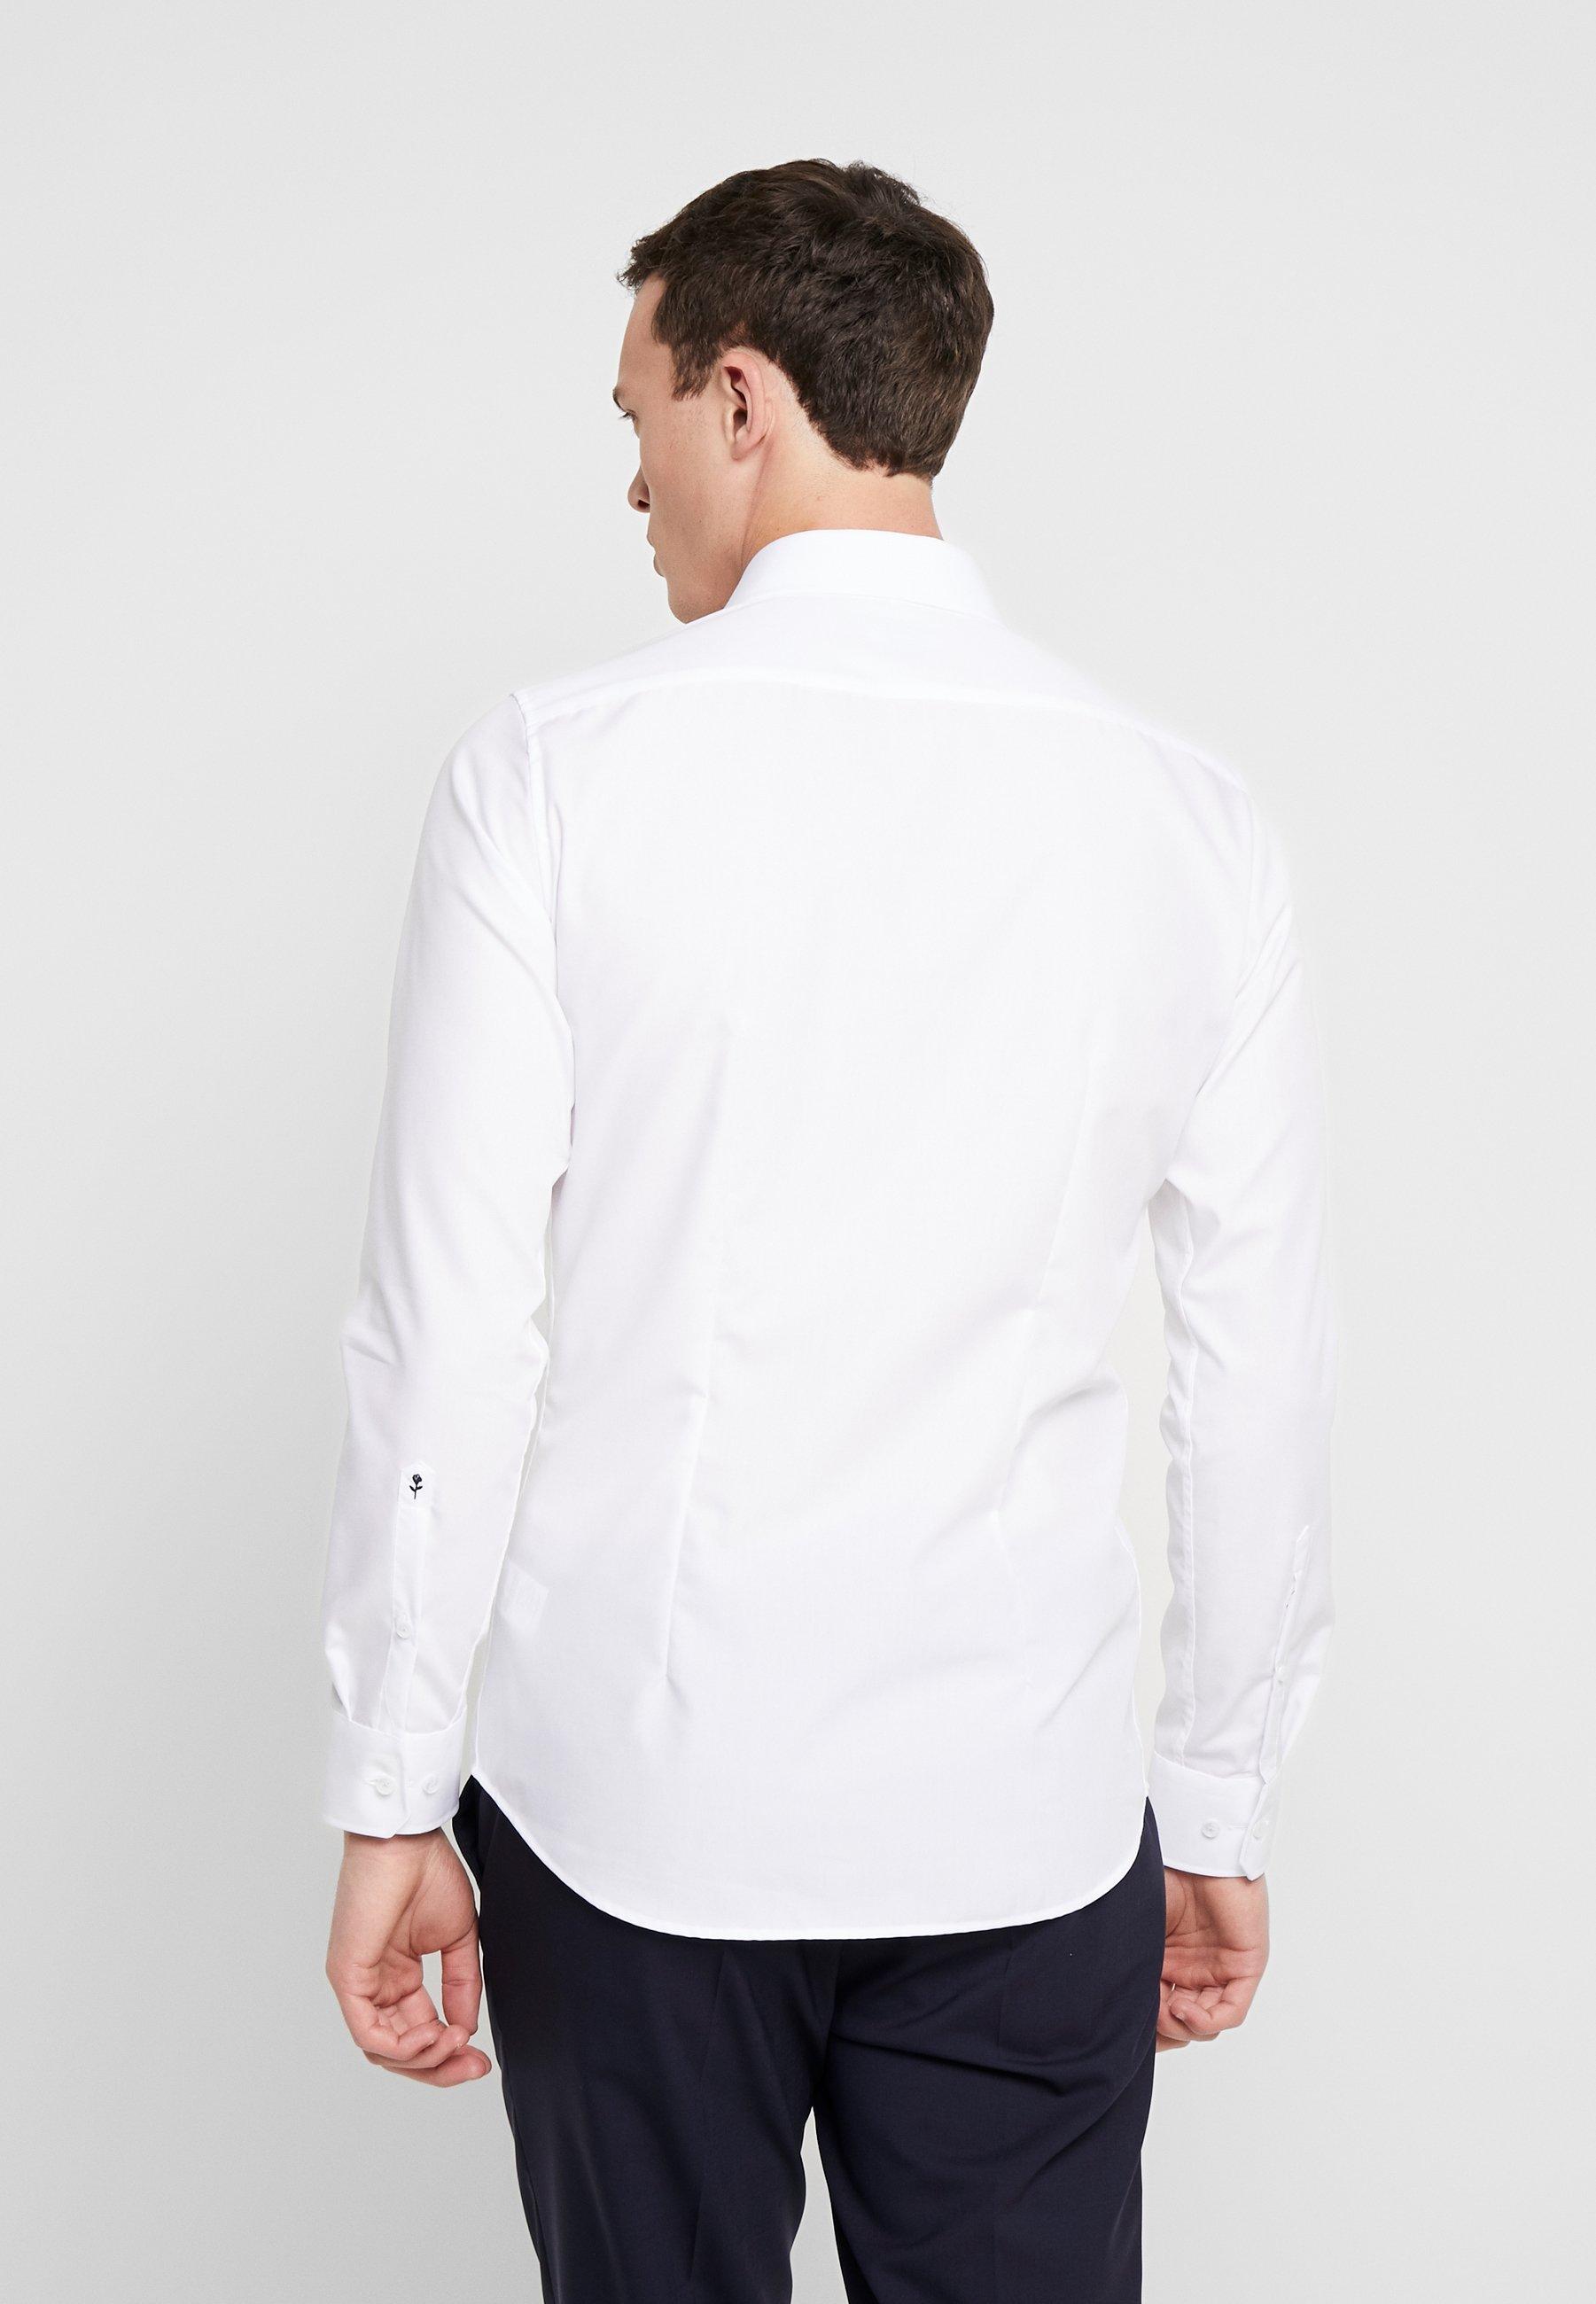 Seidensticker SLIM FIT BUSINESS KENT - Business skjorter - white - Herretøj til salg